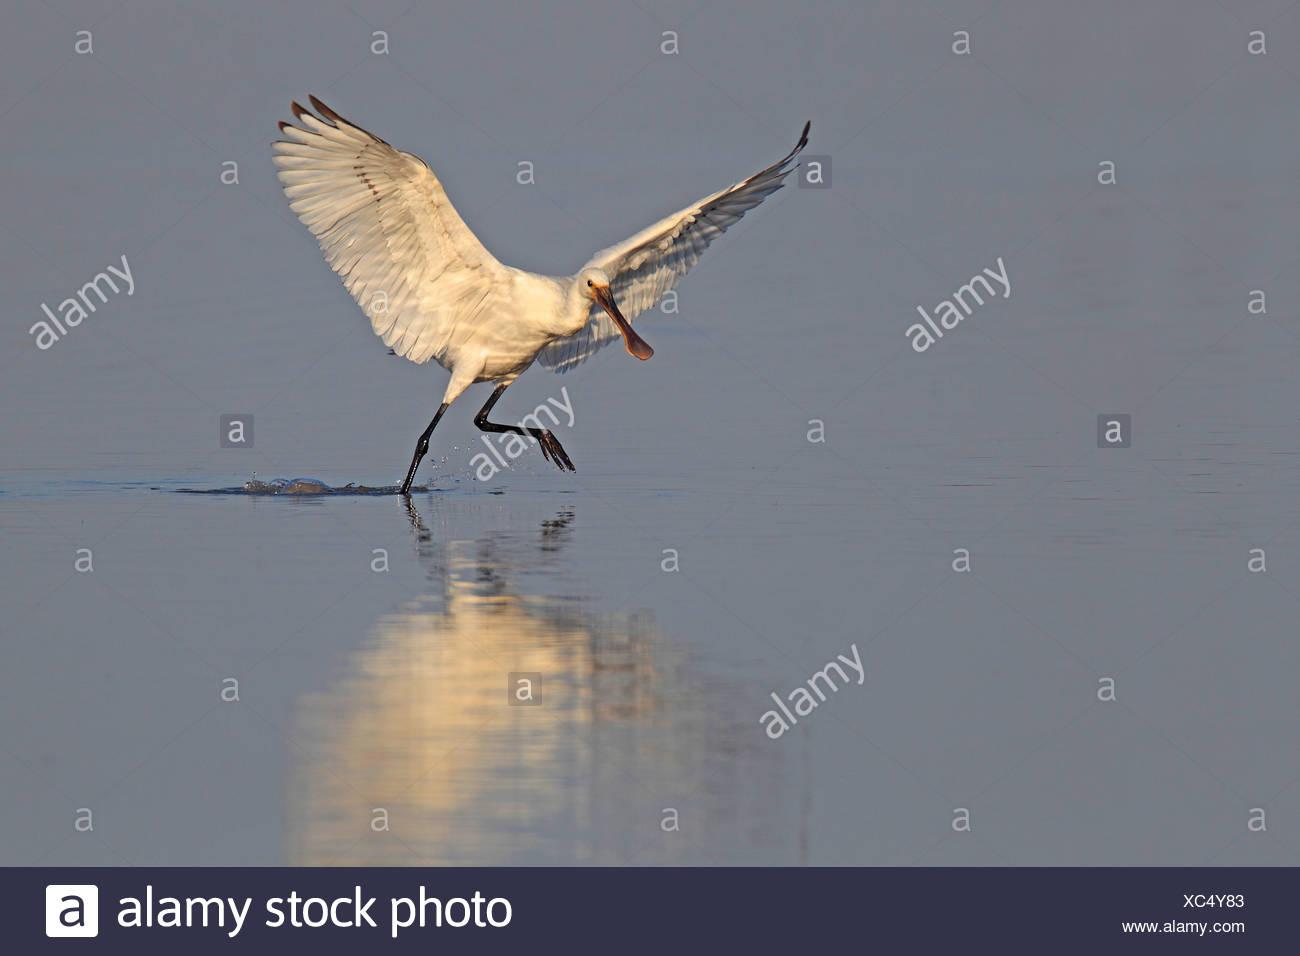 white spoonbill (Platalea leucorodia), young bird starting to fly away, Netherlands, Flevoland - Stock Image